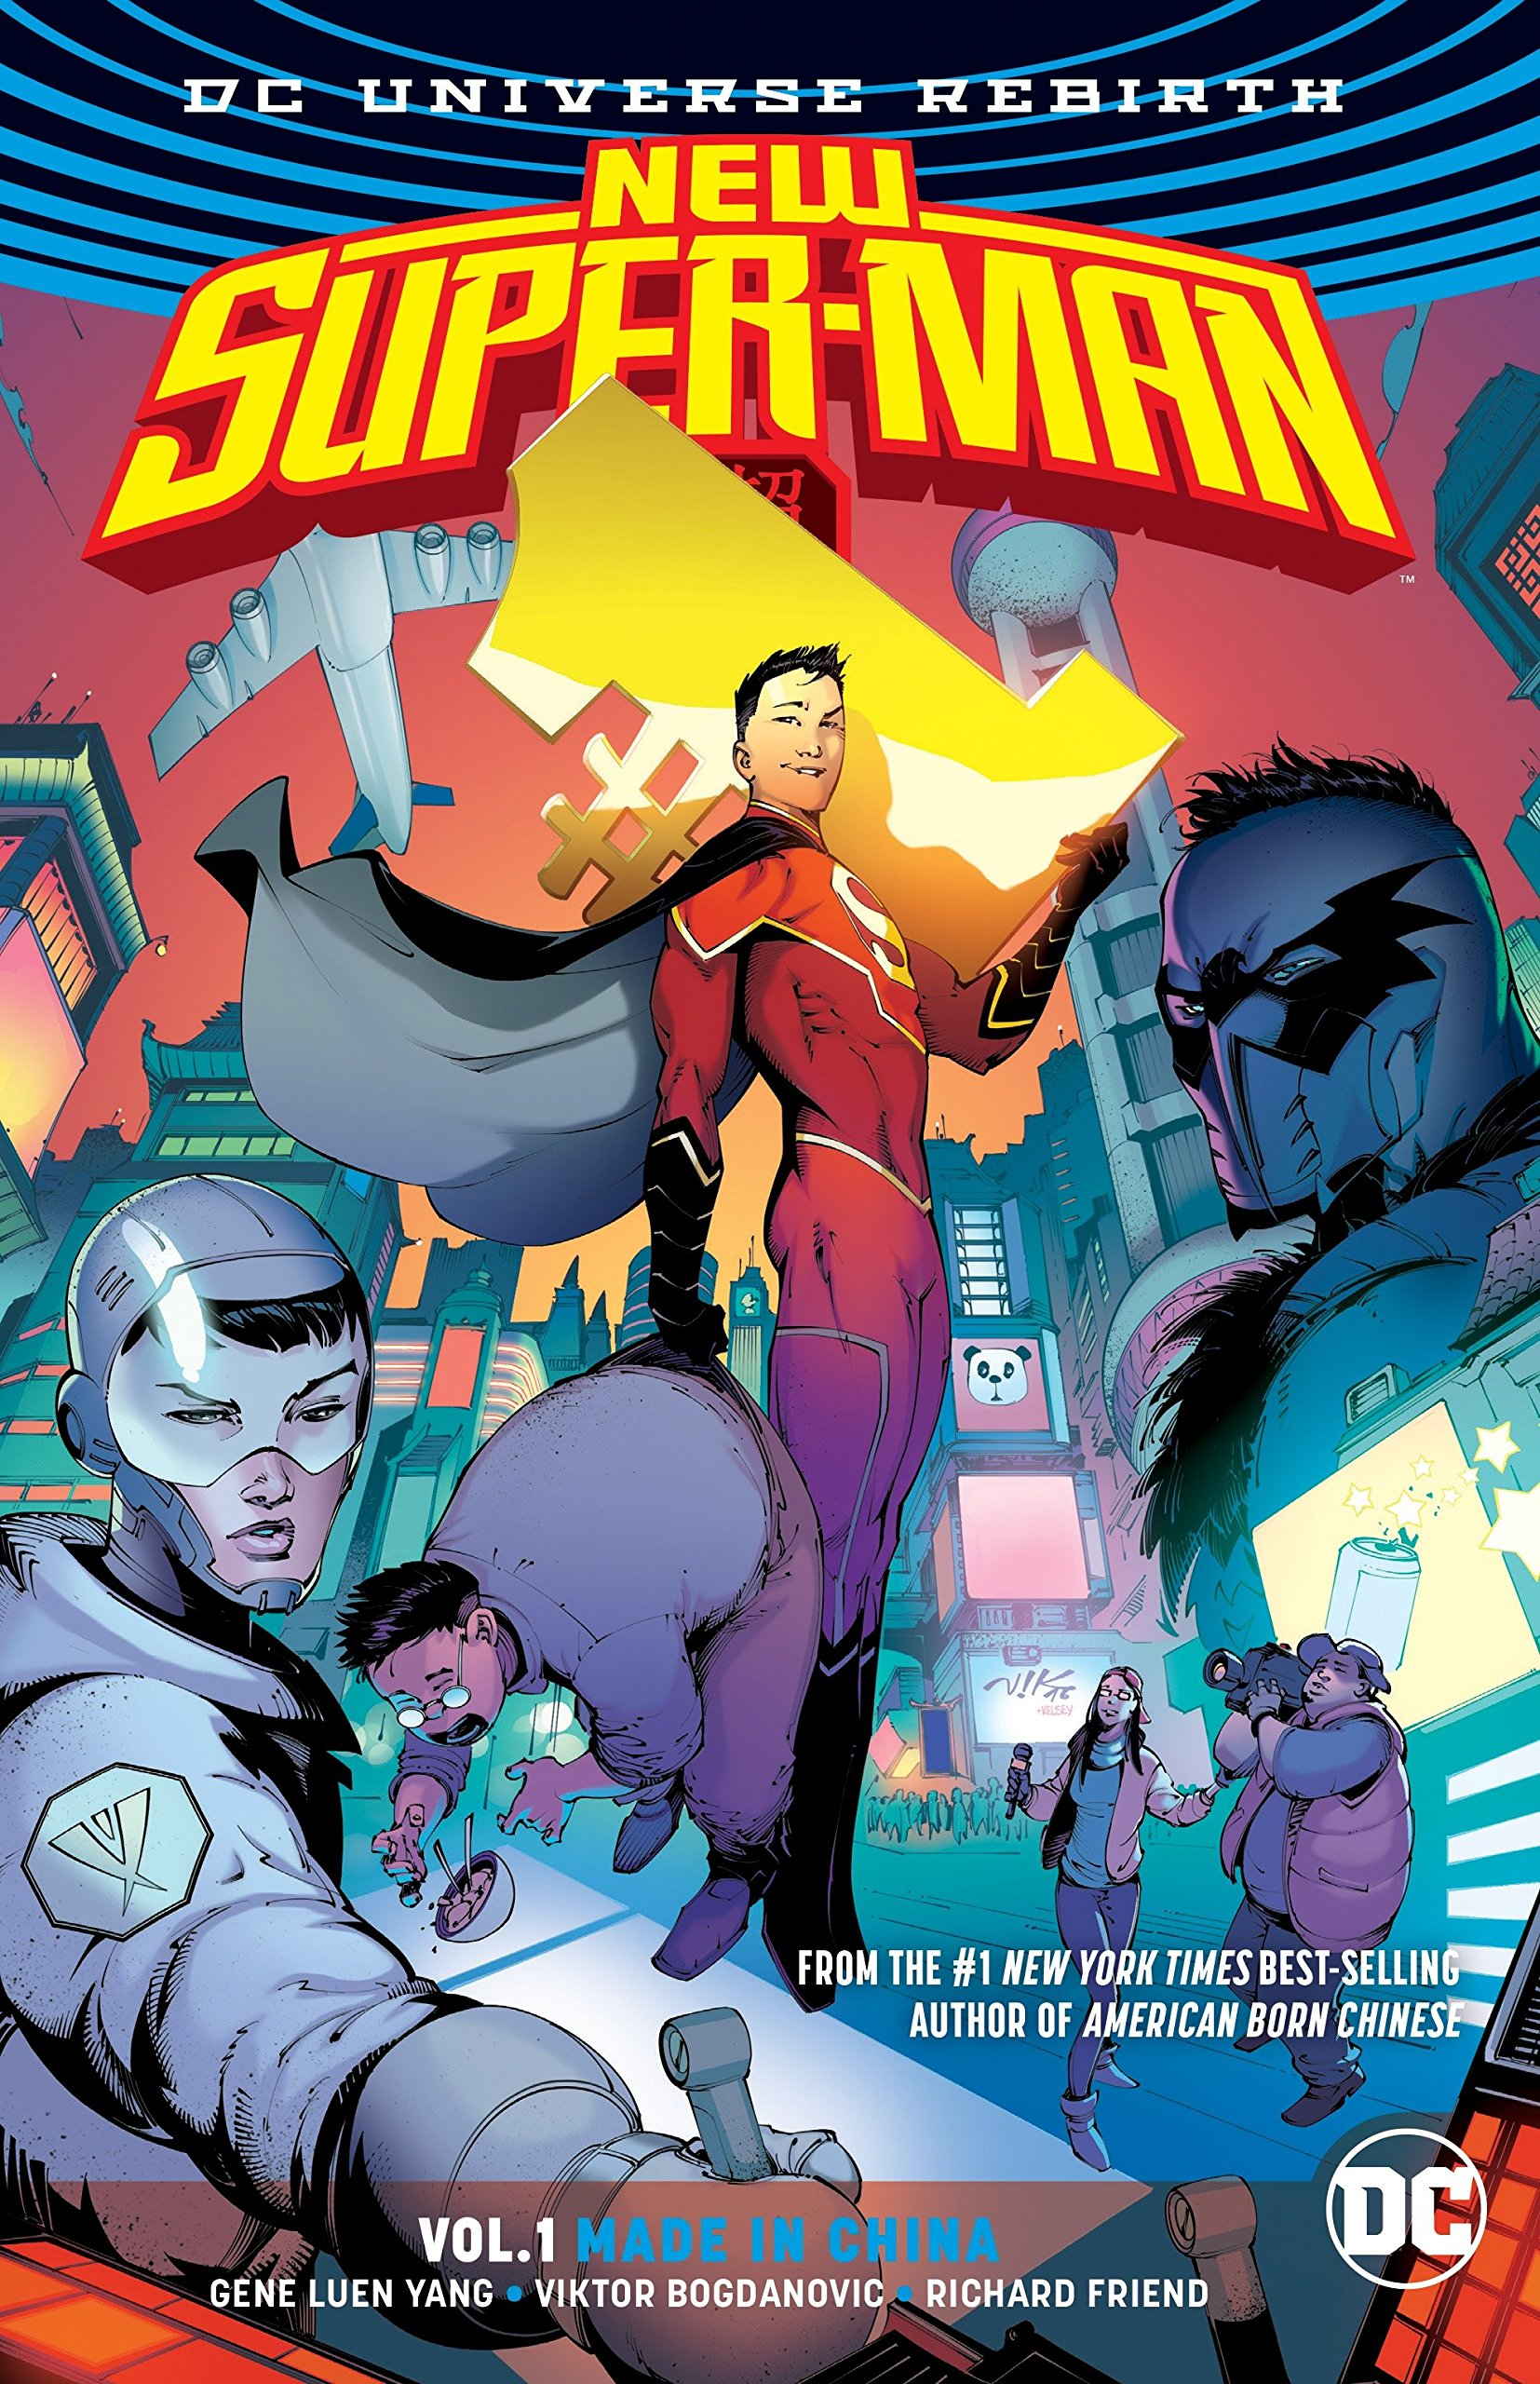 Amazon.com: New Super-Man Vol. 1: Made In China (Rebirth) (9781401270933):  Gene Luen Yang, Viktor Bogdanovic: Books